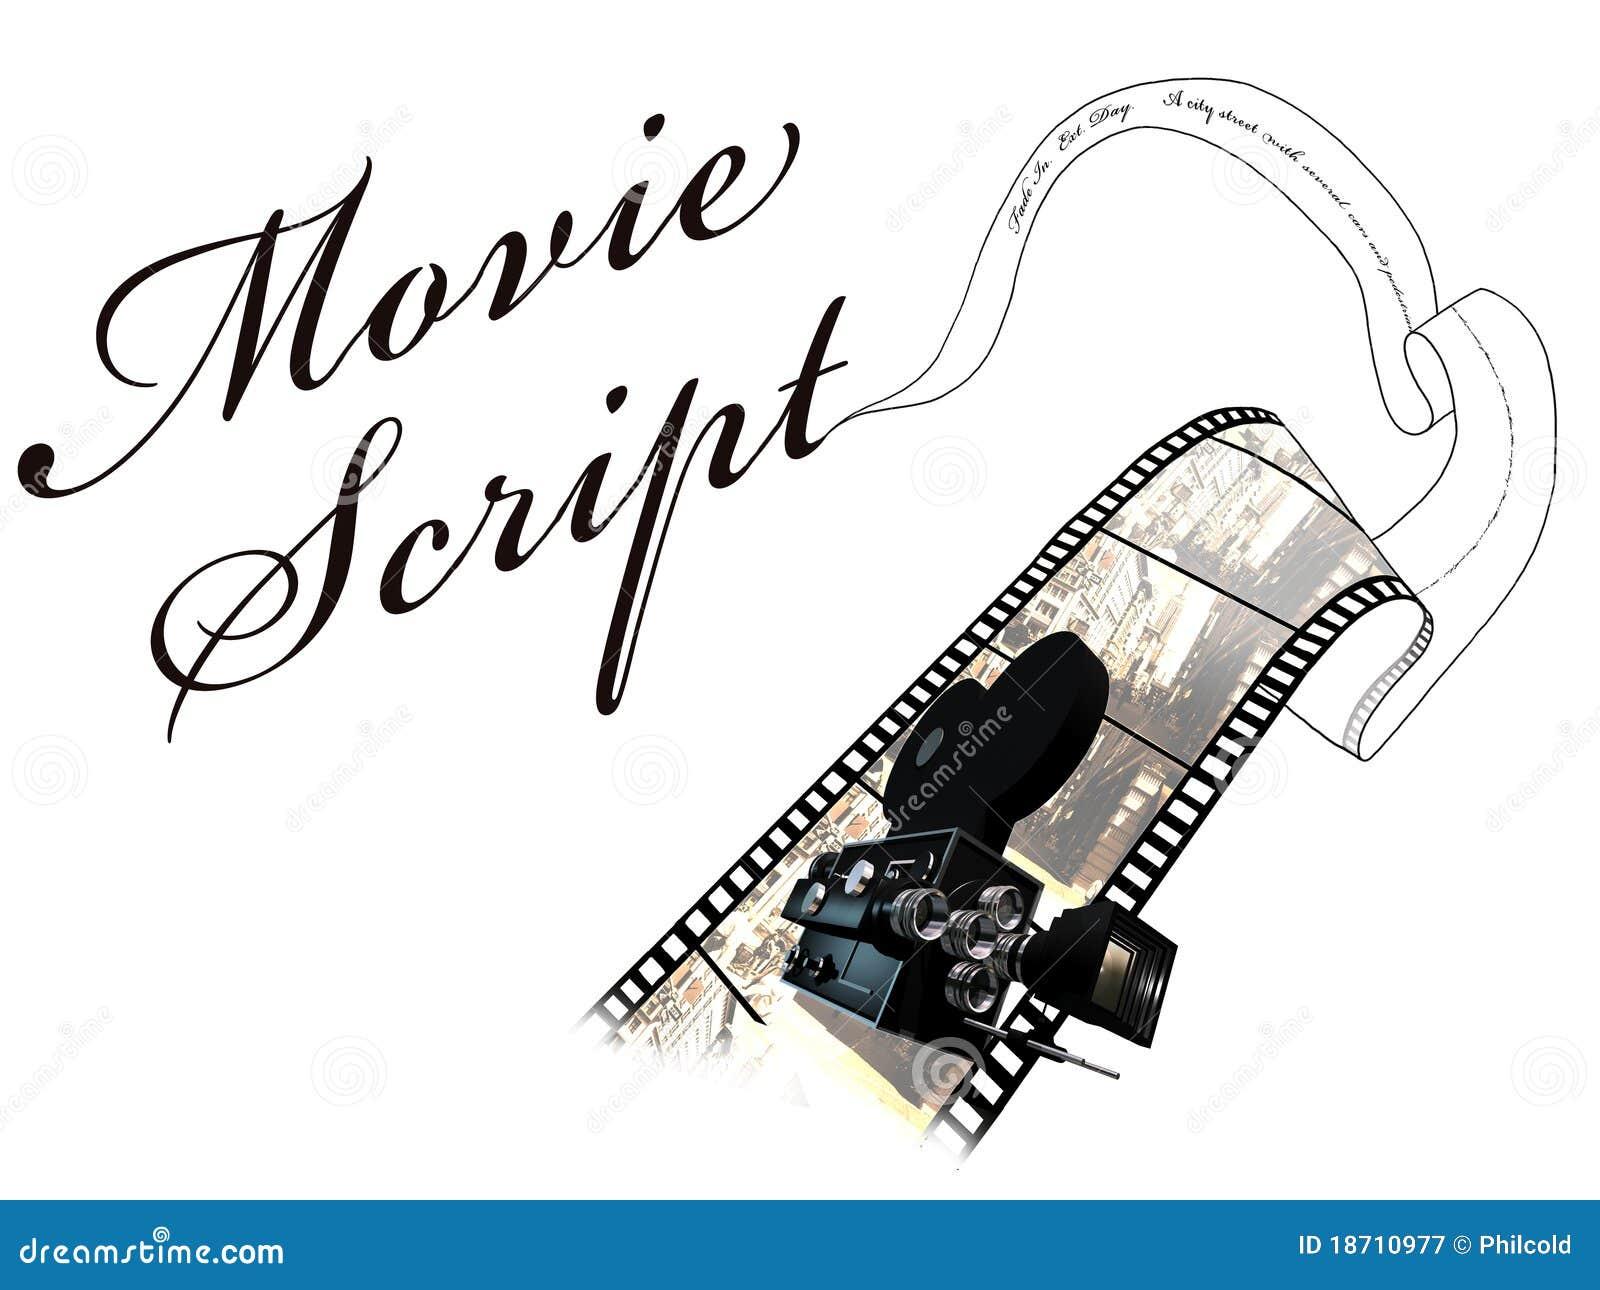 Movie script royalty free stock photography image 18710977 Script art